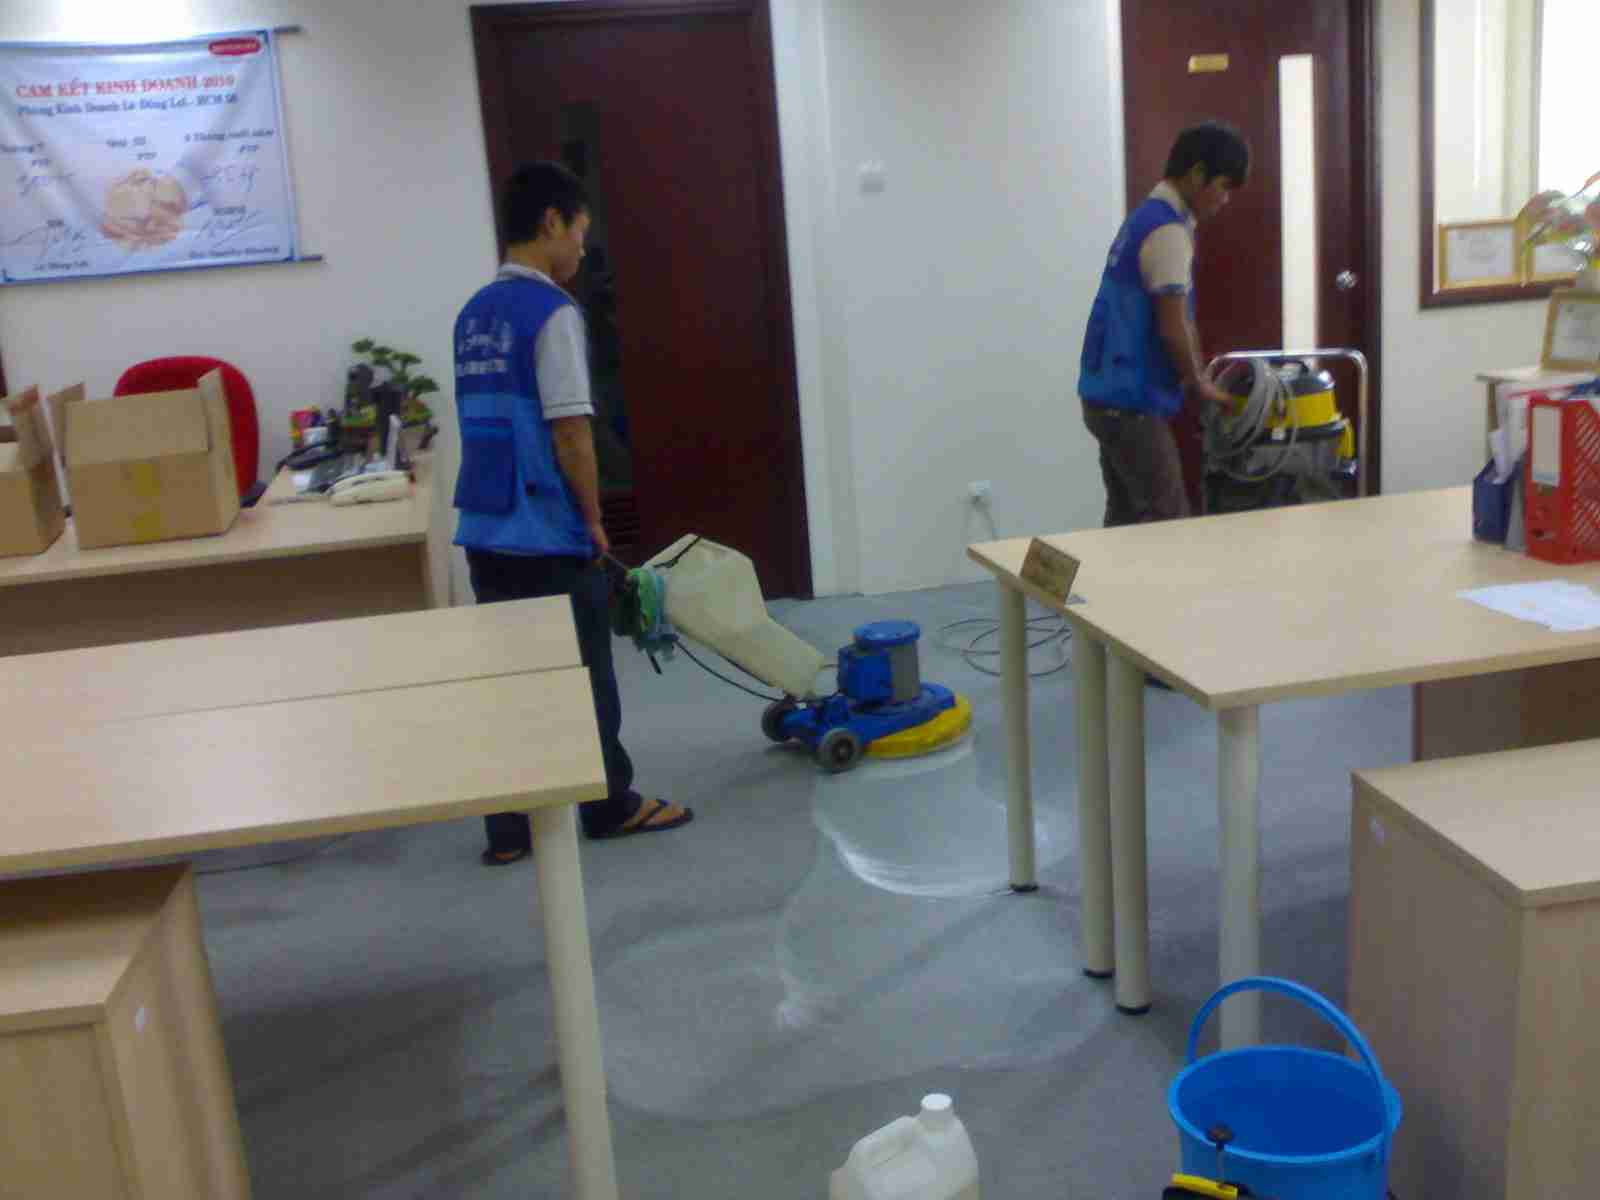 Cam kết vệ sinh sạch sẽ - vesinhnhao24h.vn